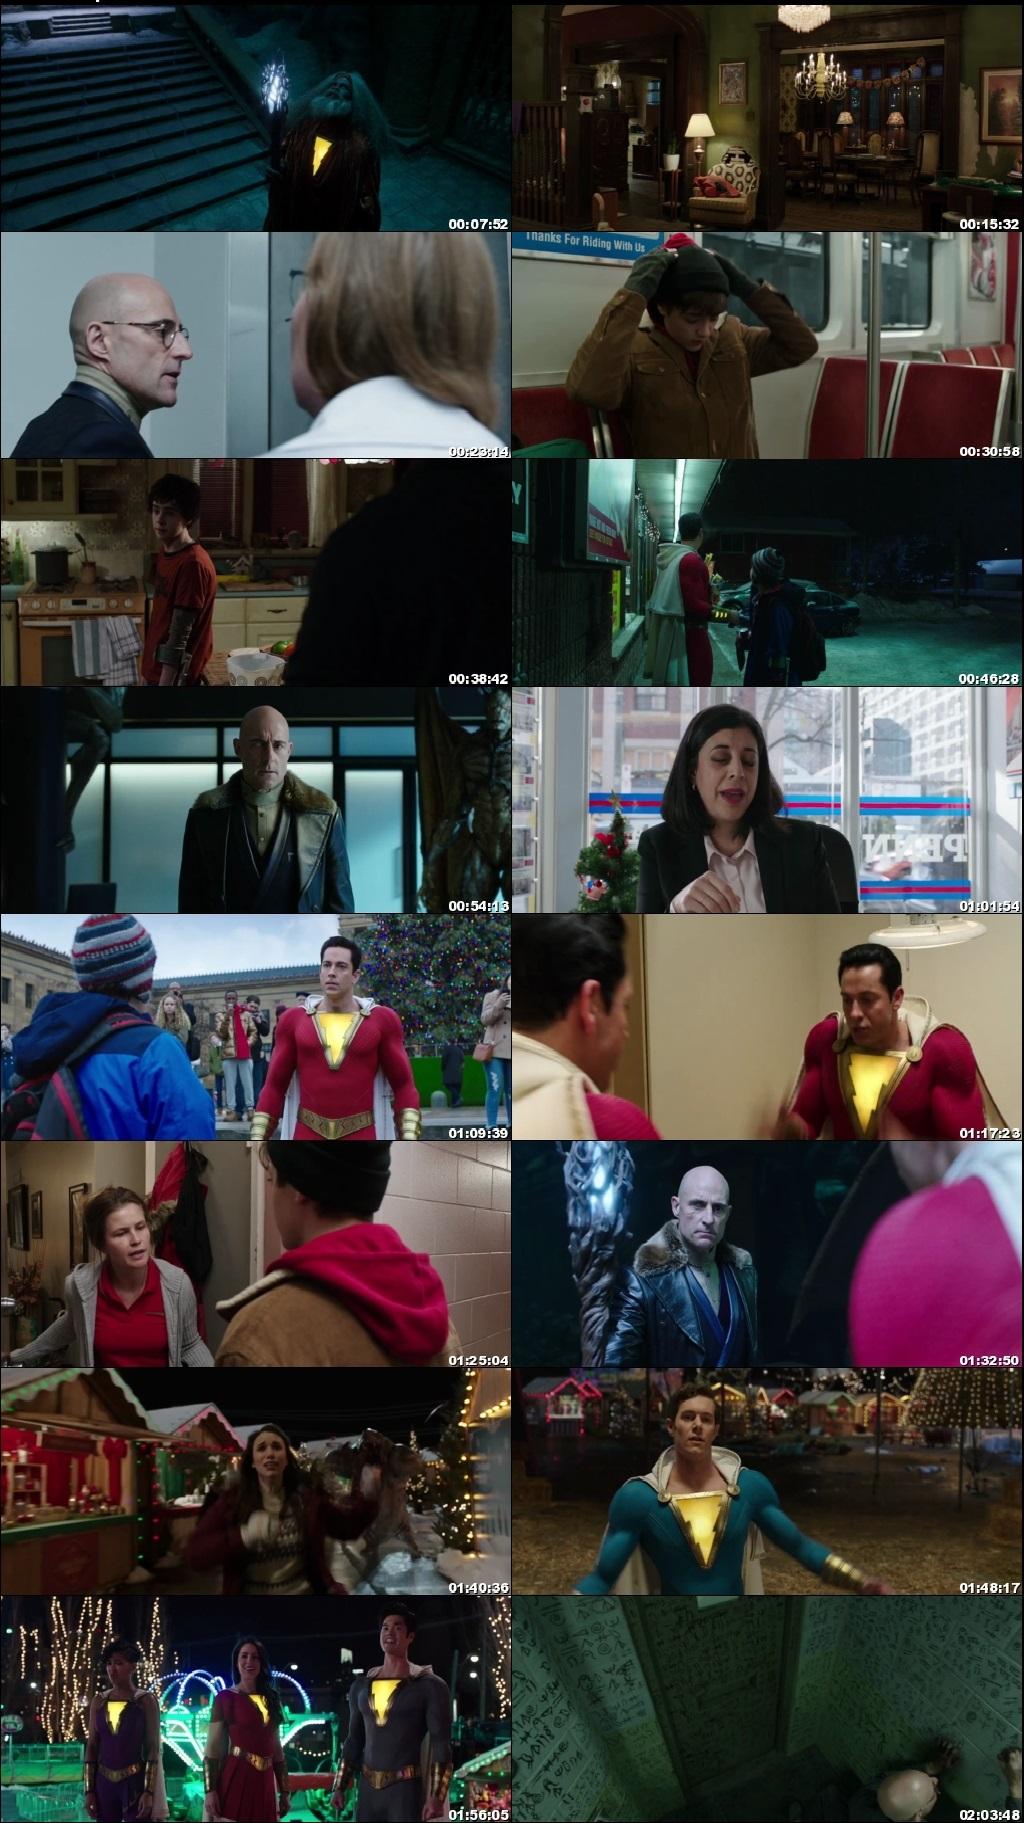 Shazam%2521%2B%25282019%2529%2B1GB%2B720P%2BBRRip%2BDual%2BAudio%2BOrg.%2B%255BHindi-English%255D Shazam! 2019 300MB Full Movie In Hindi Dubbed 1080P HEVC FHD